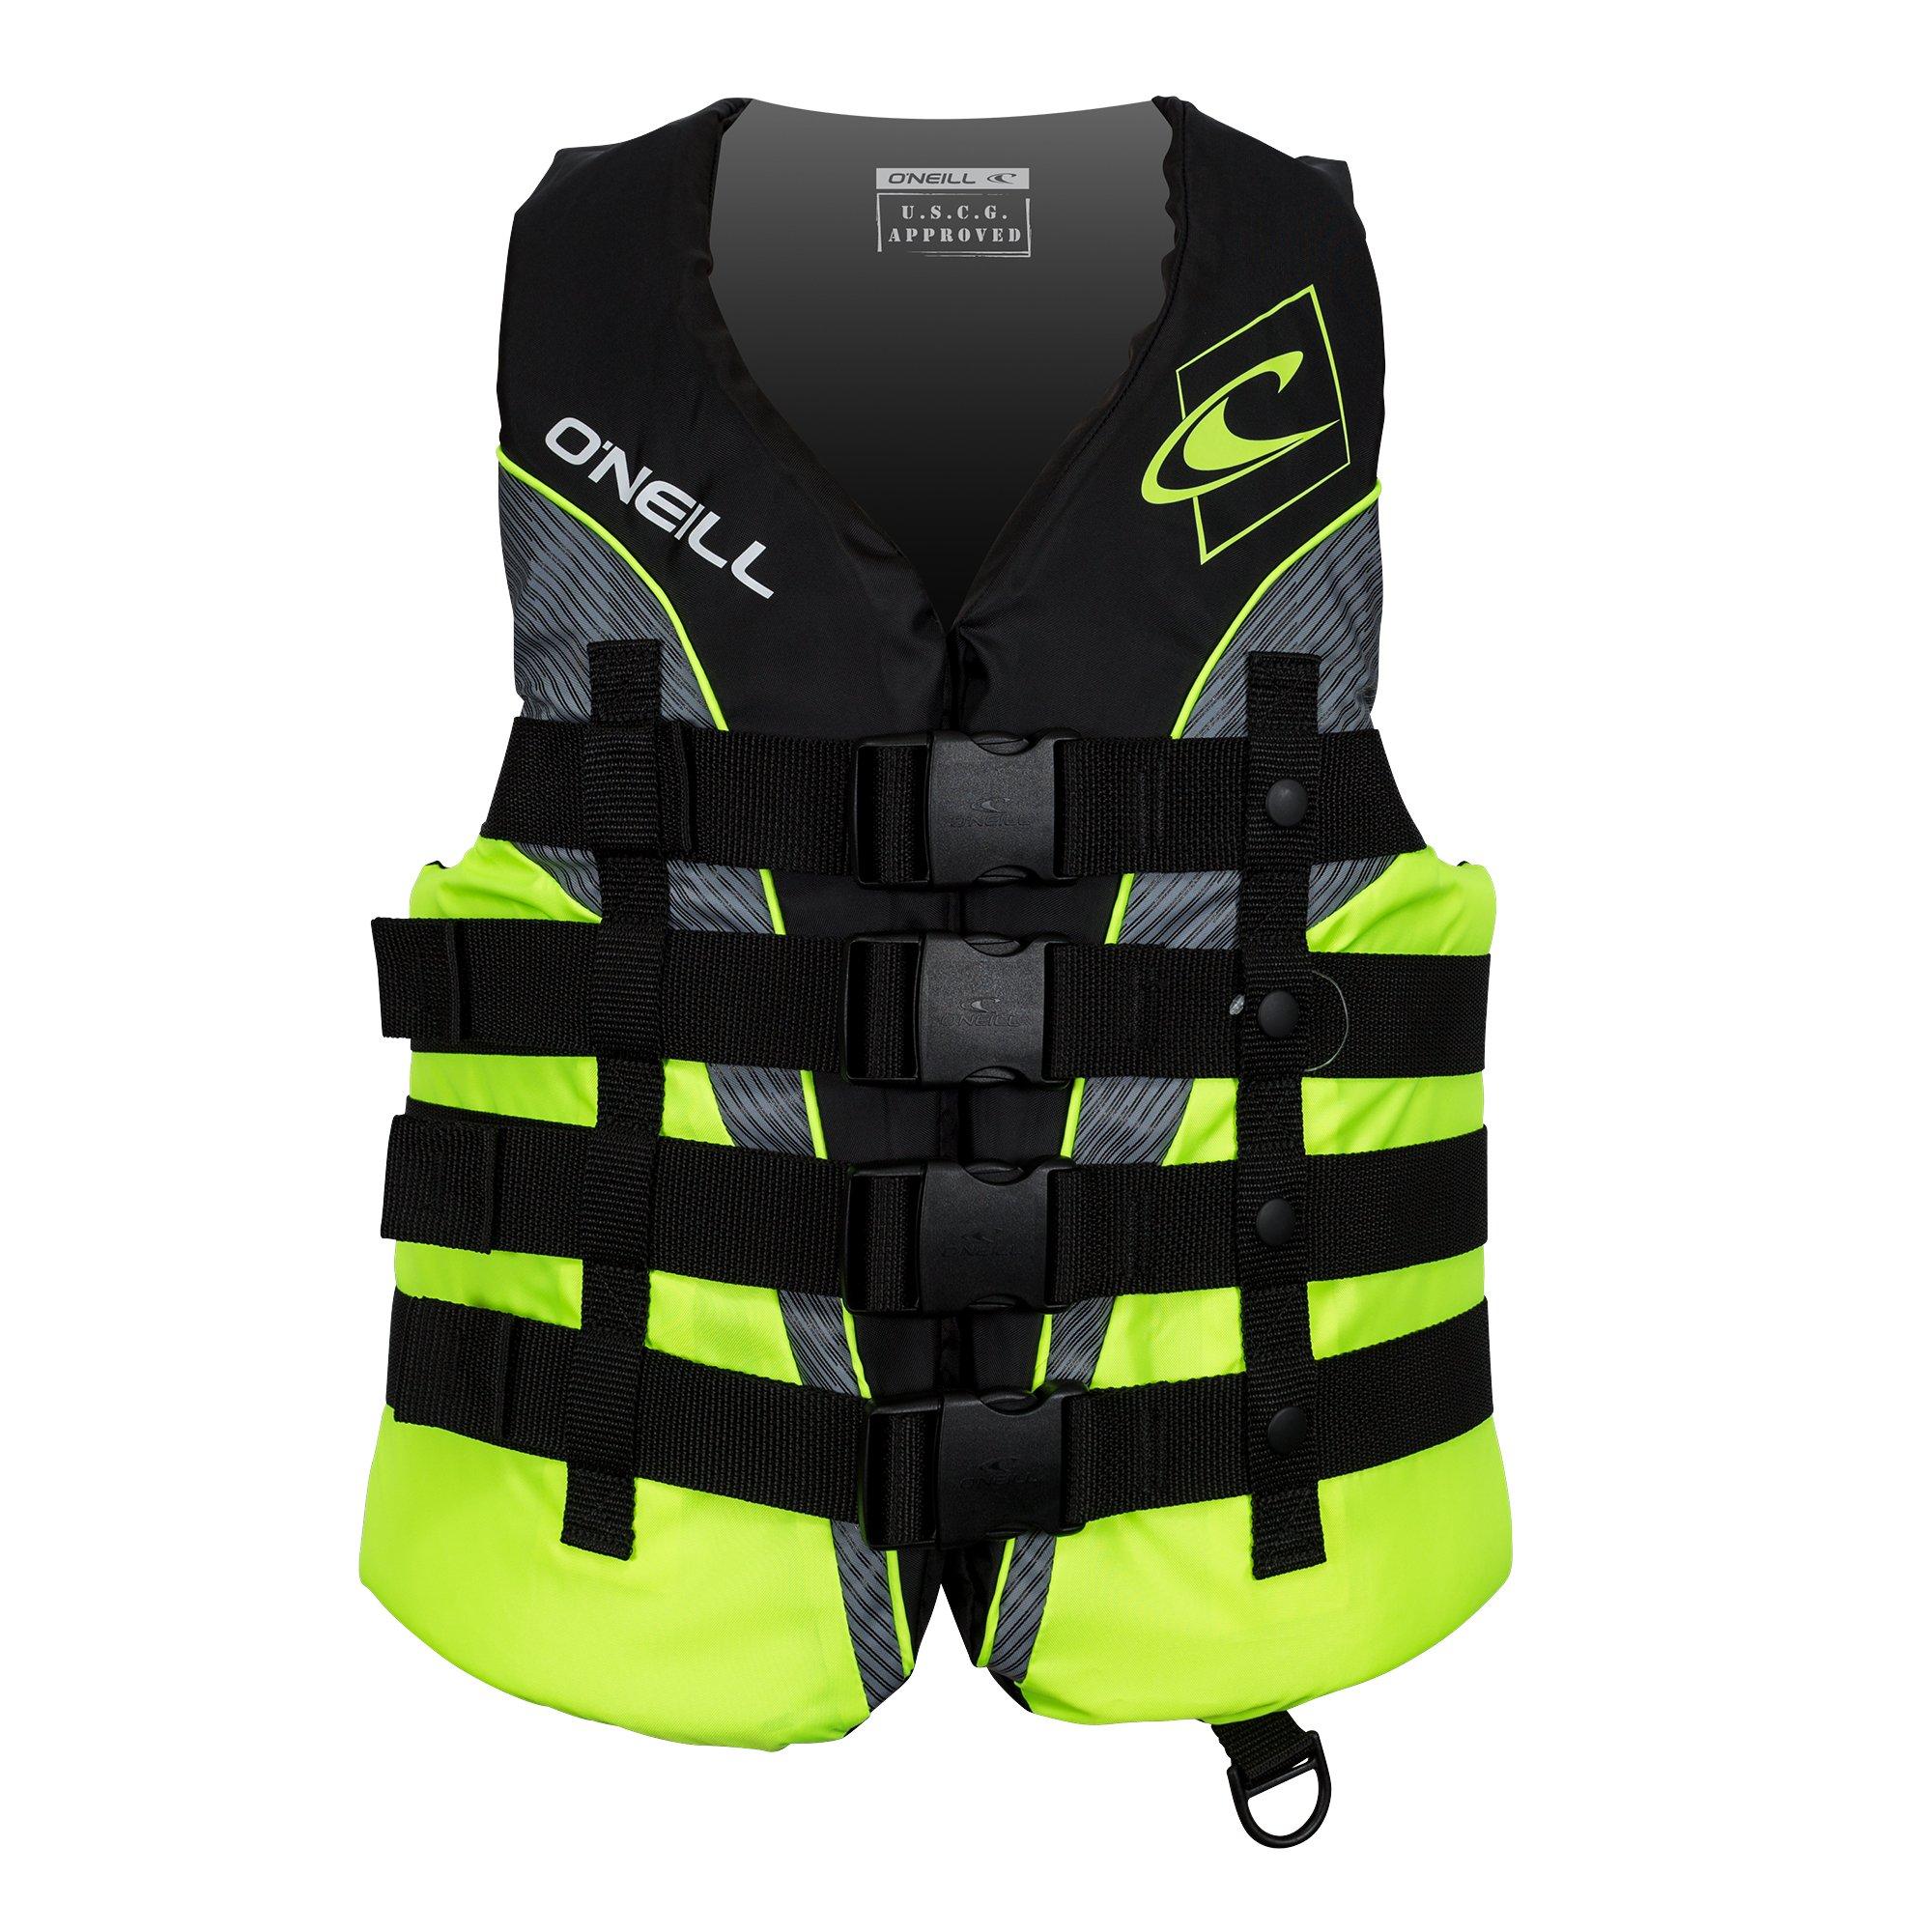 O'Neill  Men's Superlite USCG Life Vest,Black/Lime/Smoke/Lime,Large